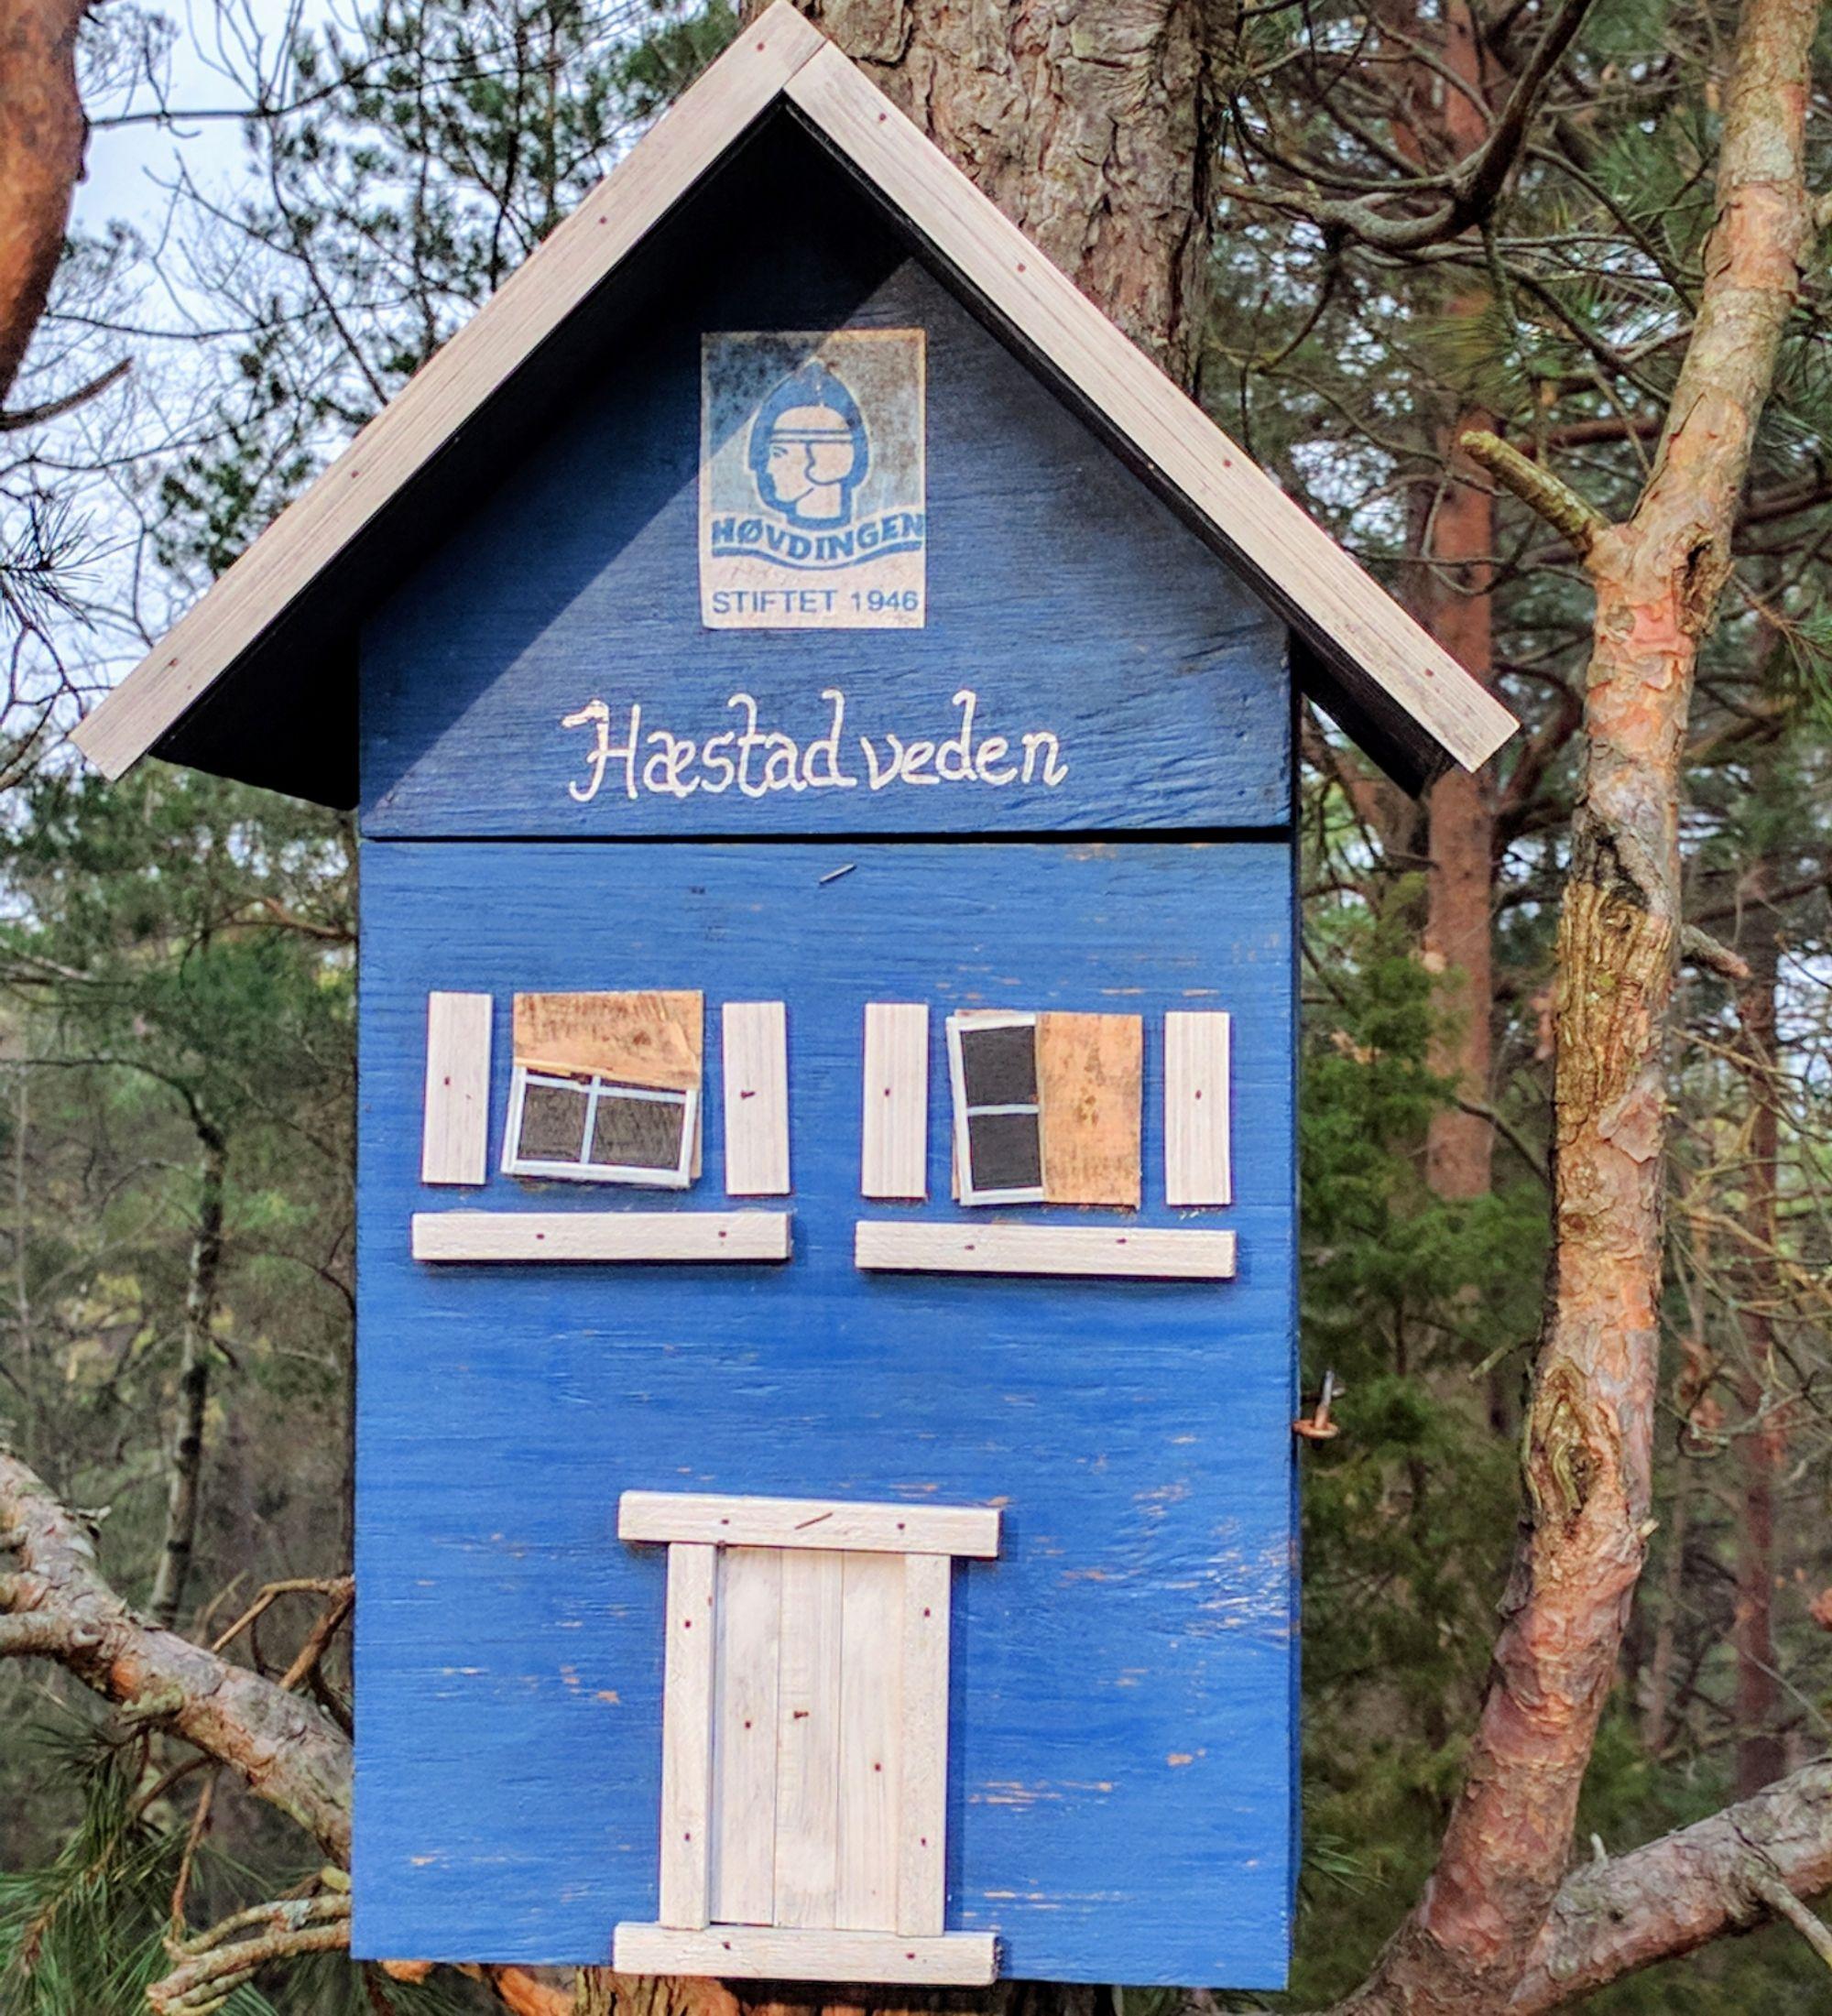 Ny post på bloggen. Tur til Hestadveden - http://www.leisegang.no/tur-til-hestadveden/